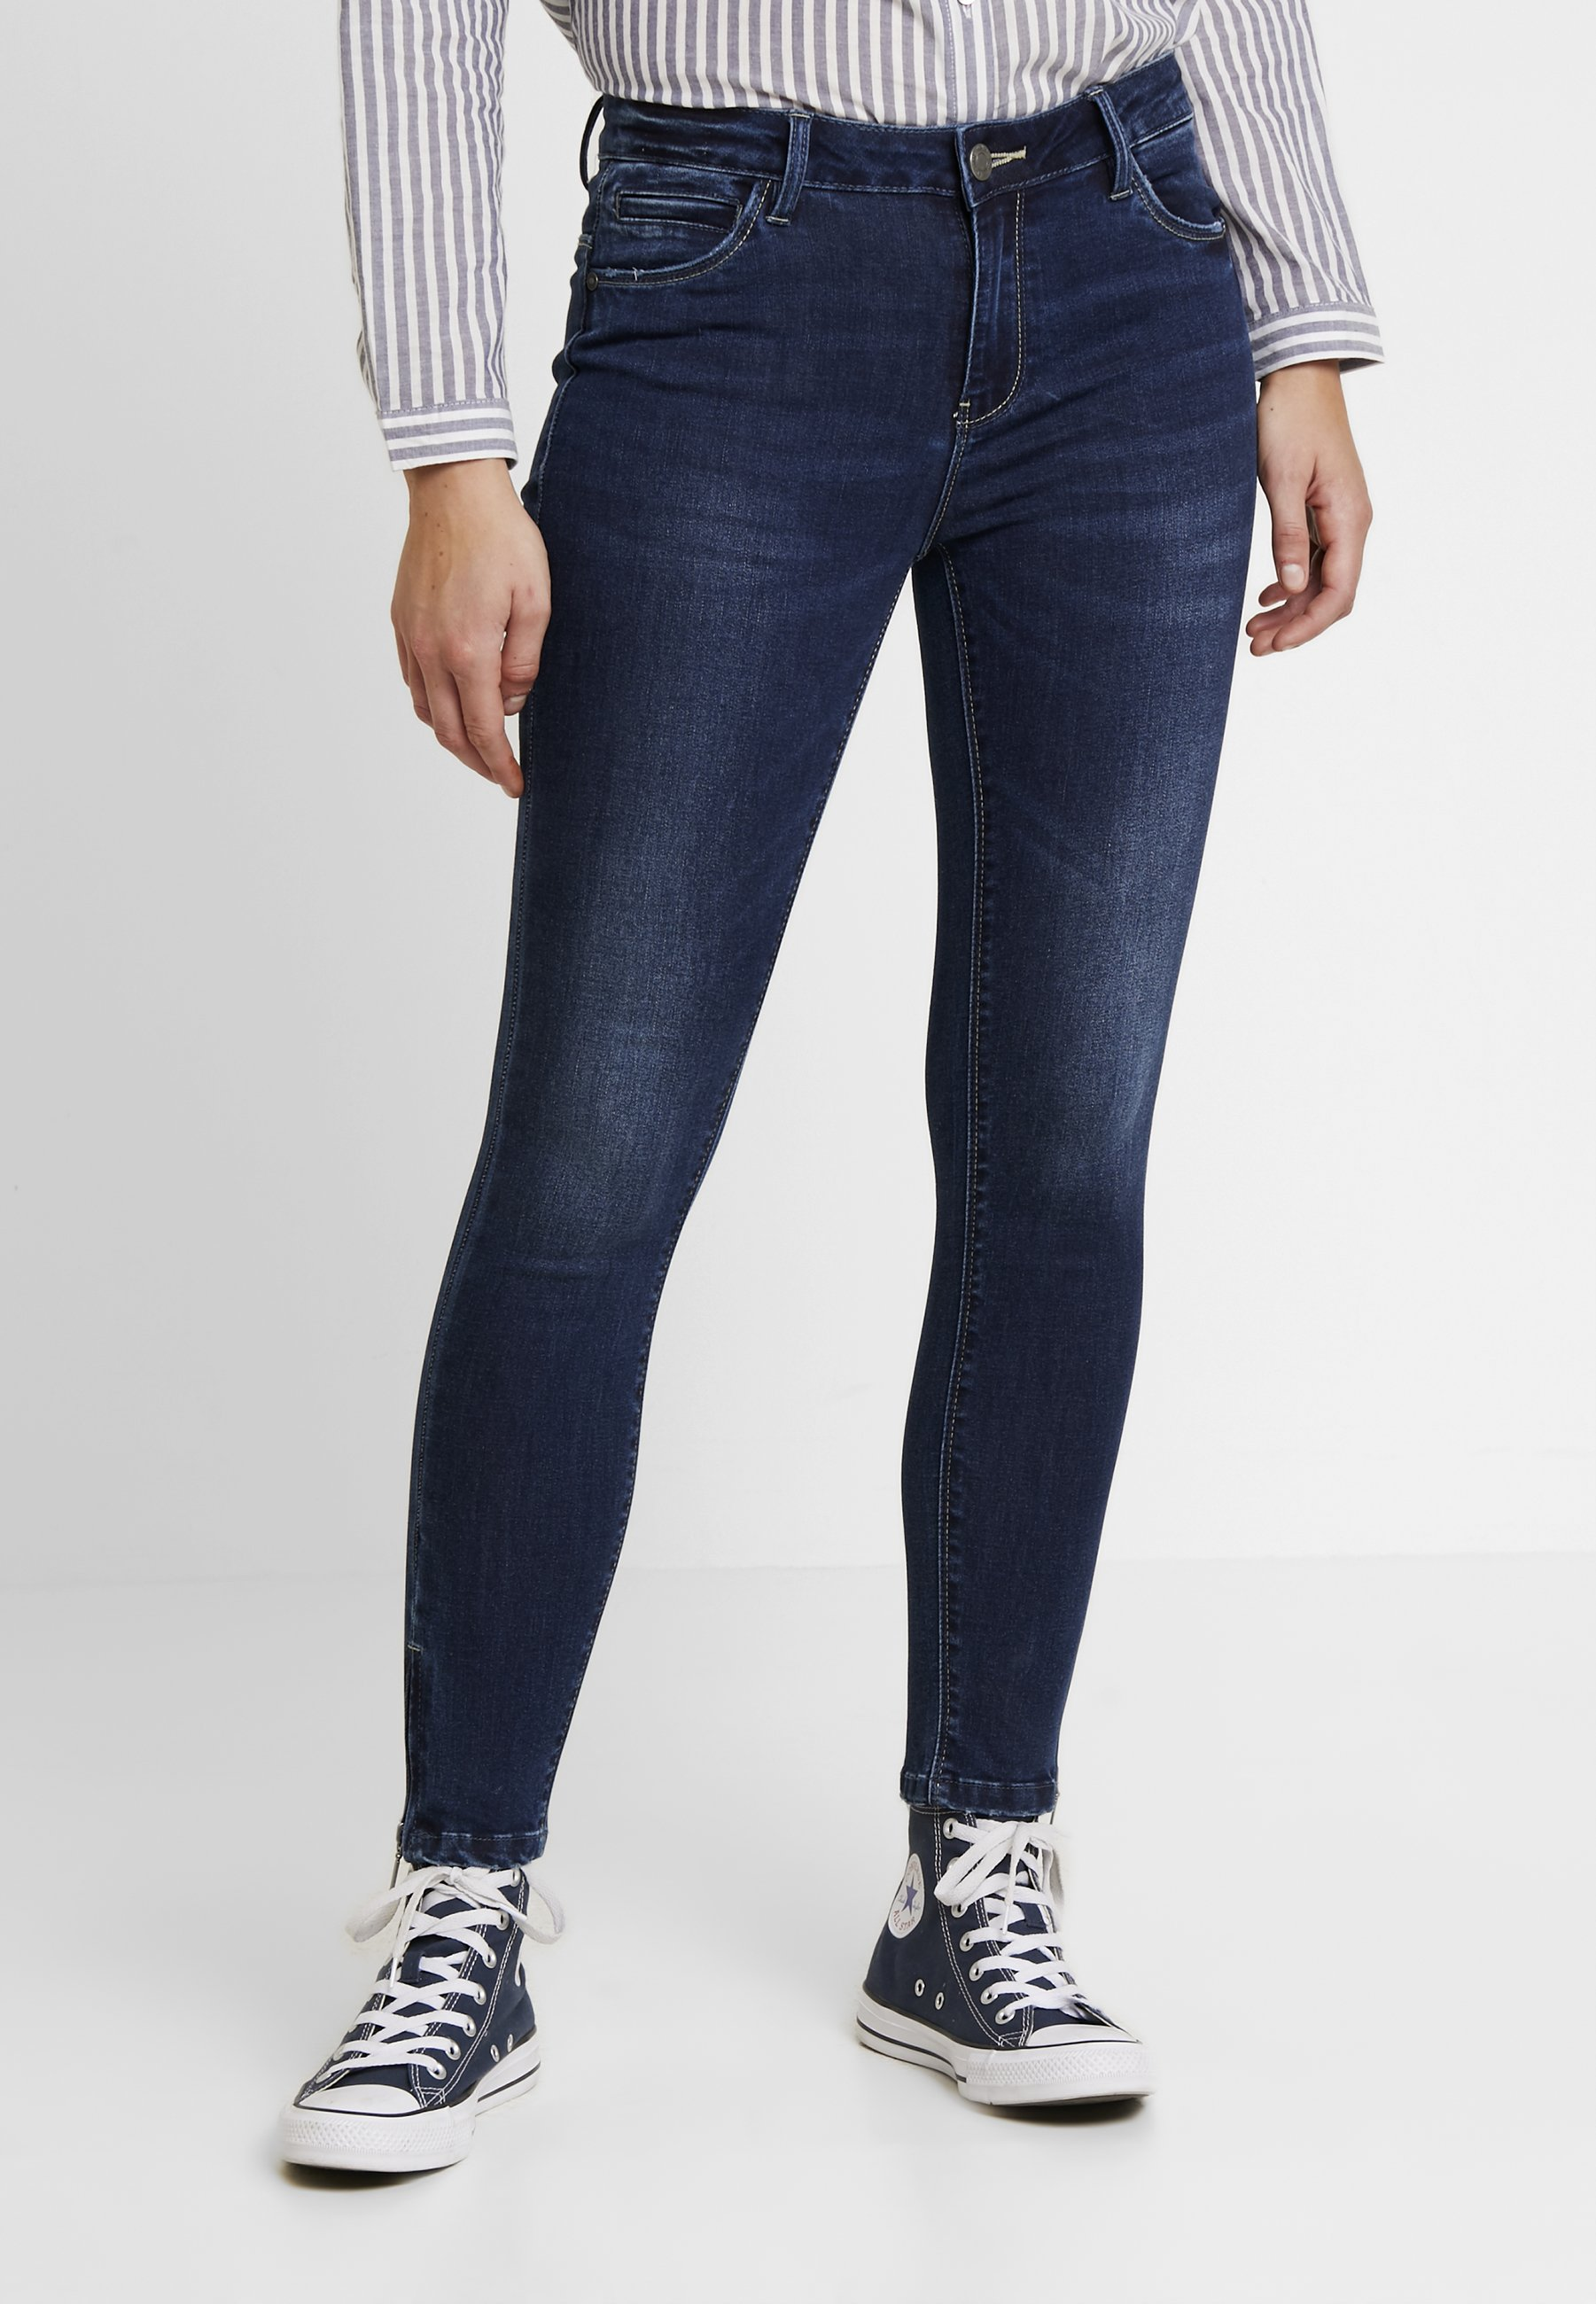 May Nmkimmy Ankle Skinny Dark Blue Noisy Denim ZipJeans PkuXiZ